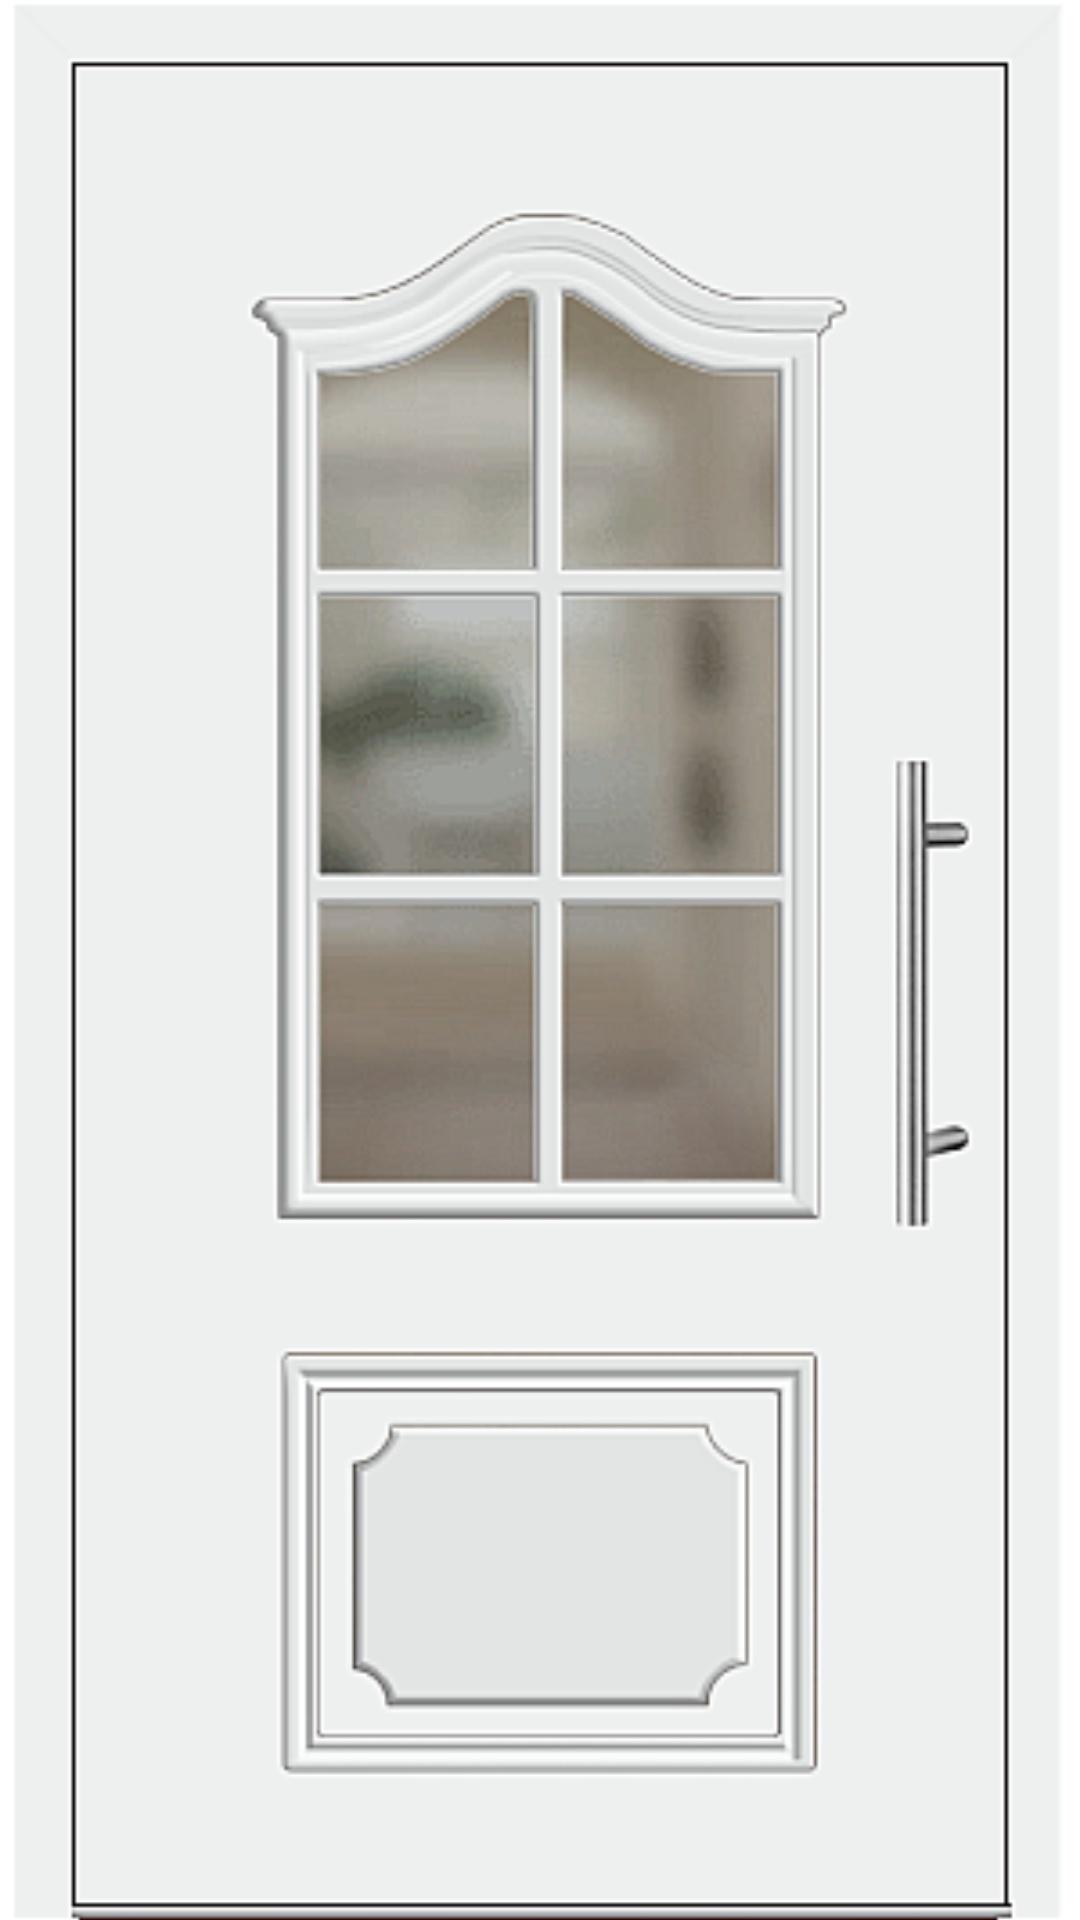 Aluminium Haustür Modell 6554-15 weiß